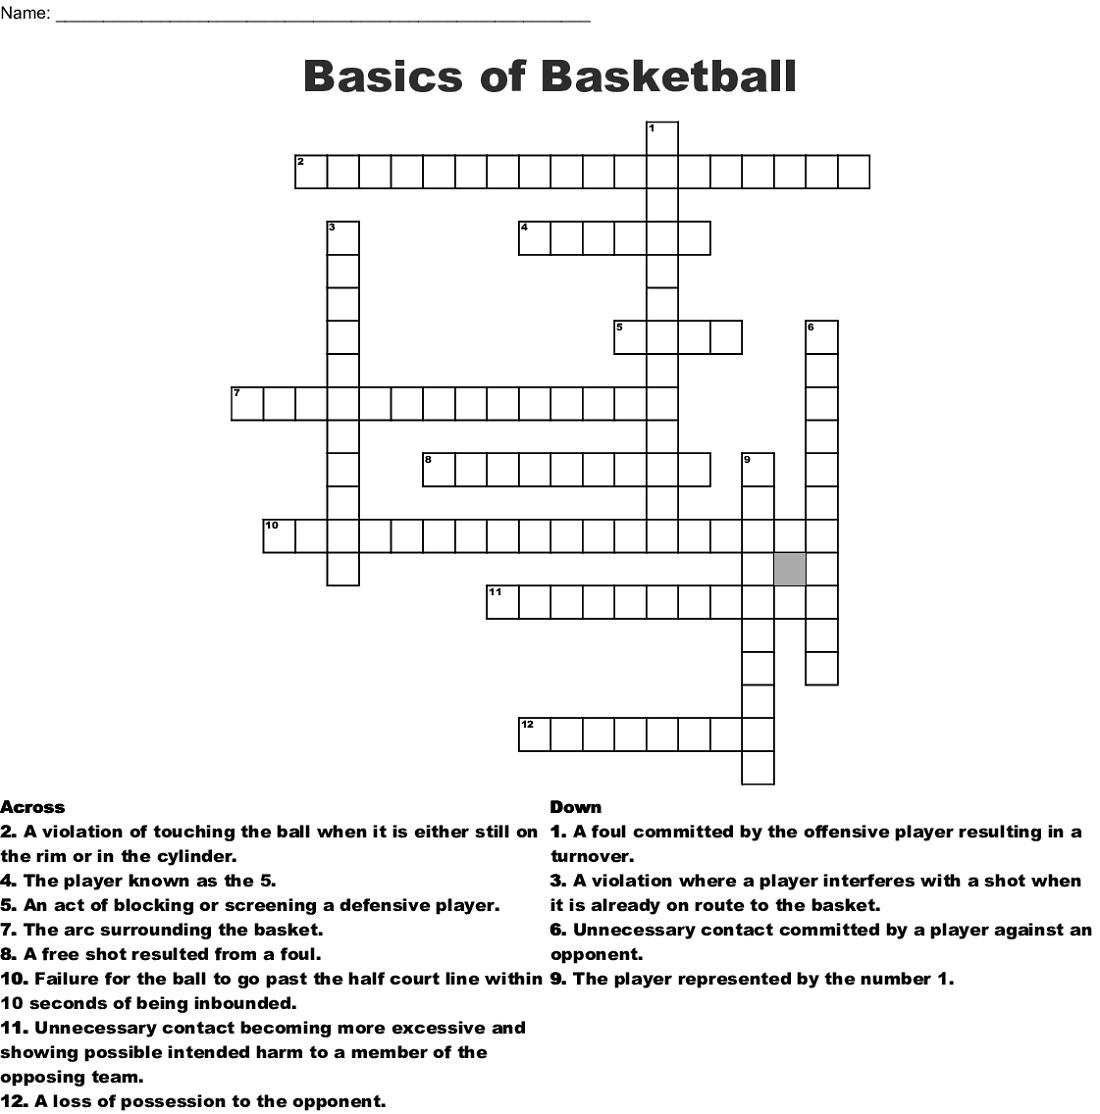 basic basketball crossword puzzles